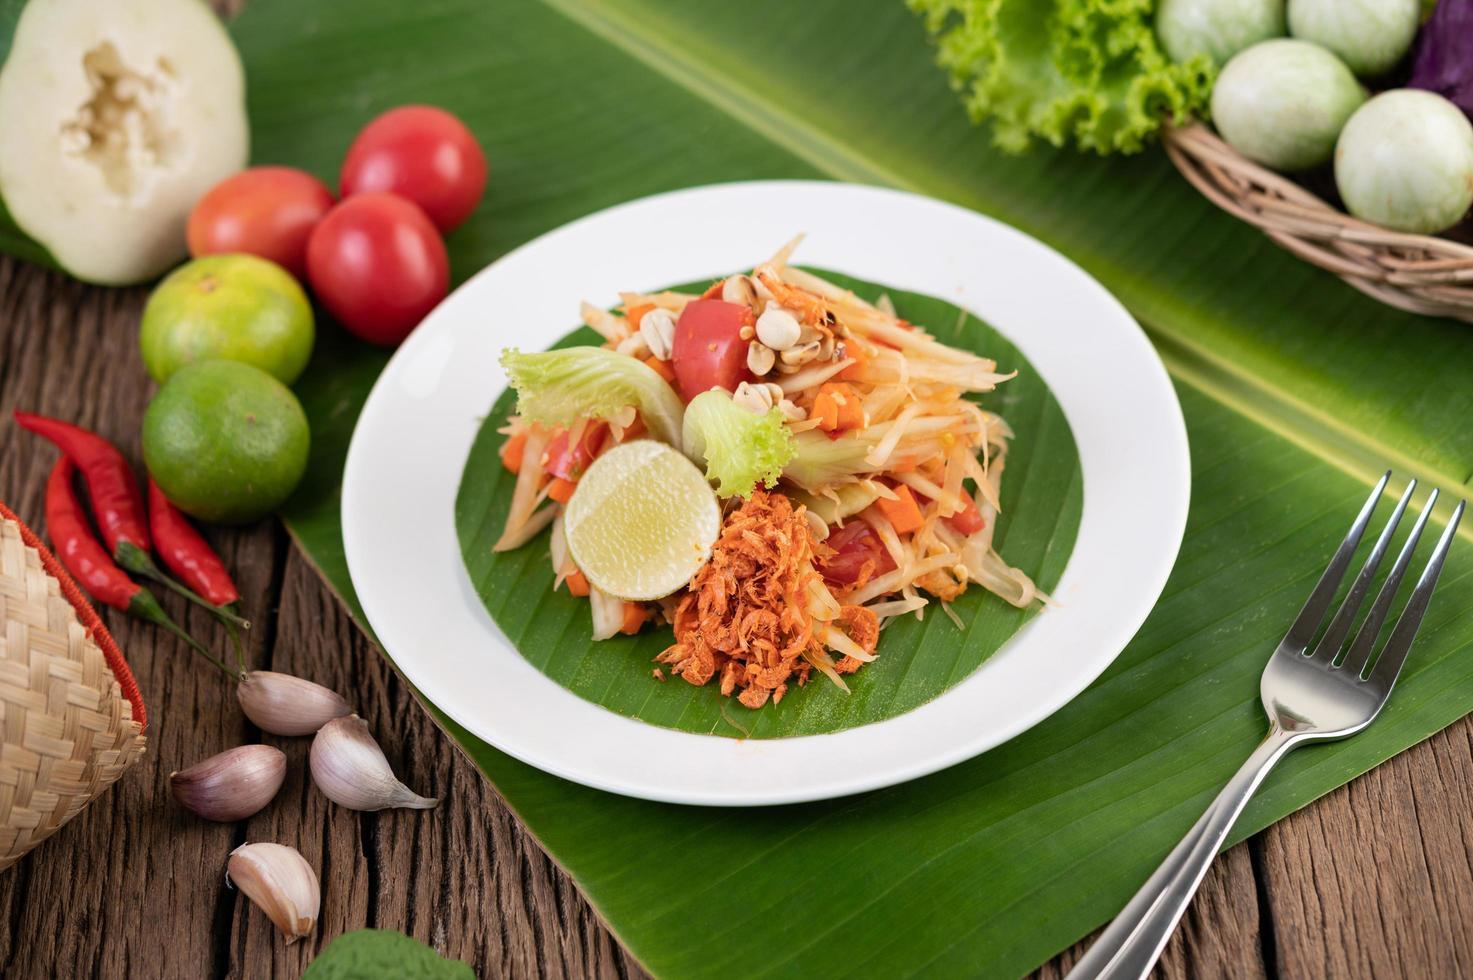 Thaise papajasalade met bananenbladeren en verse ingrediënten foto